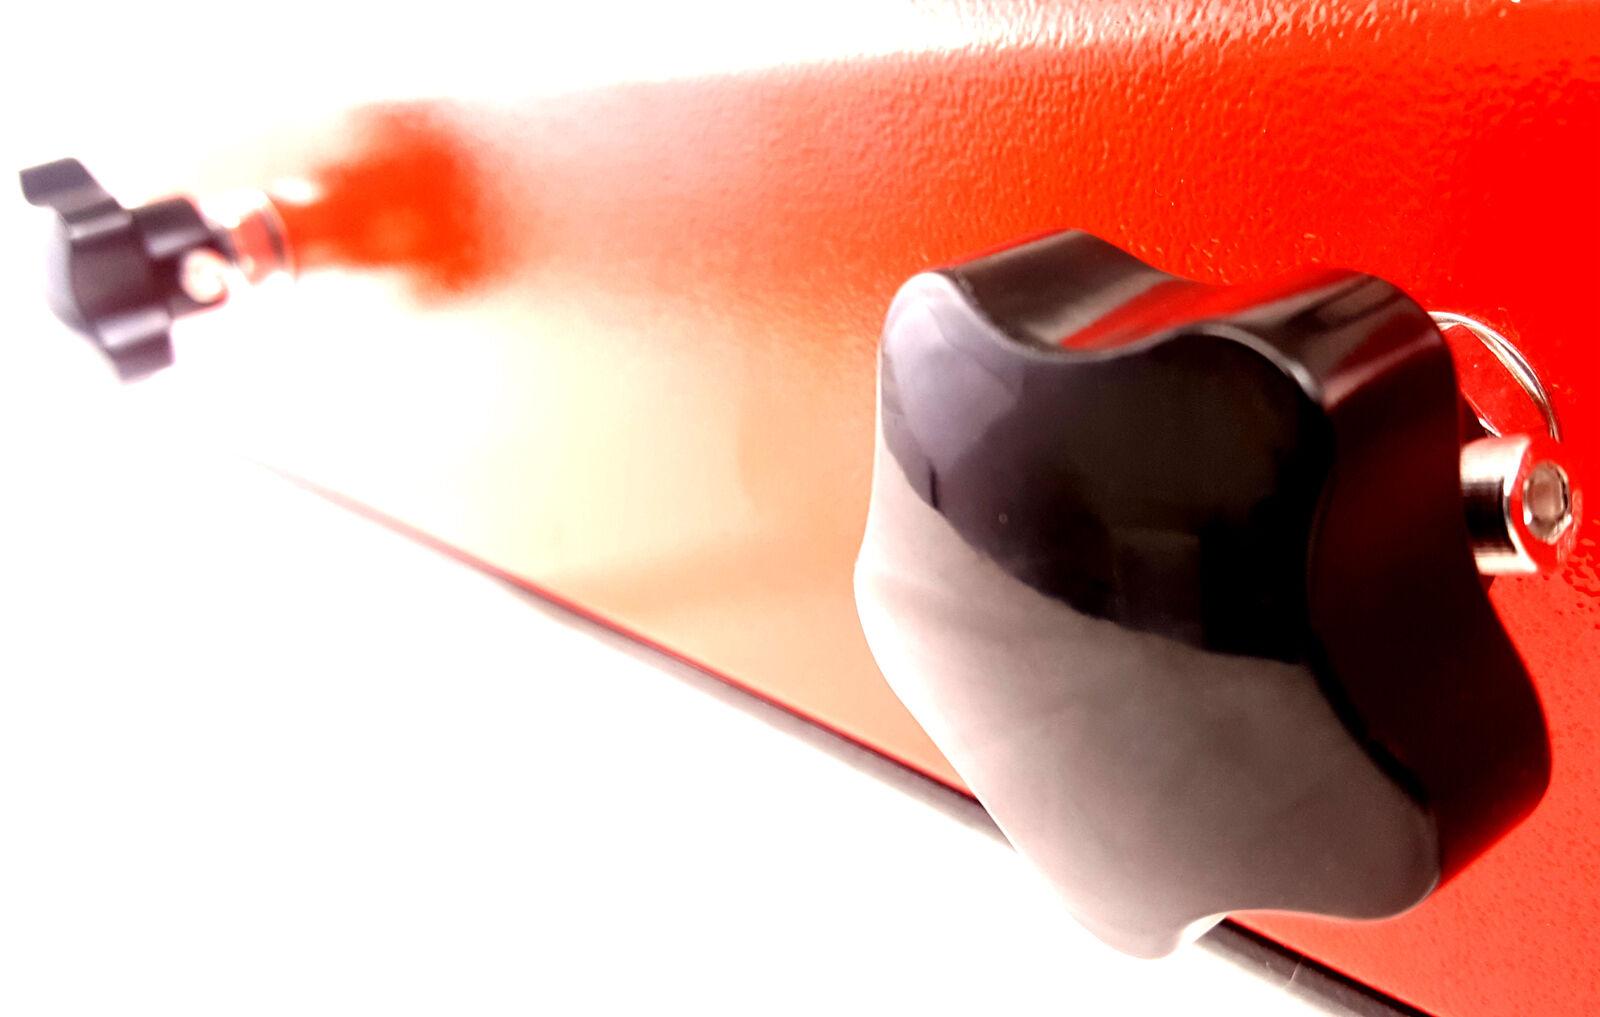 MugPressMicrotecNewest 2 2 2 In 1 MP-20B forStraight (Durham) &LatteMugs dedb9e